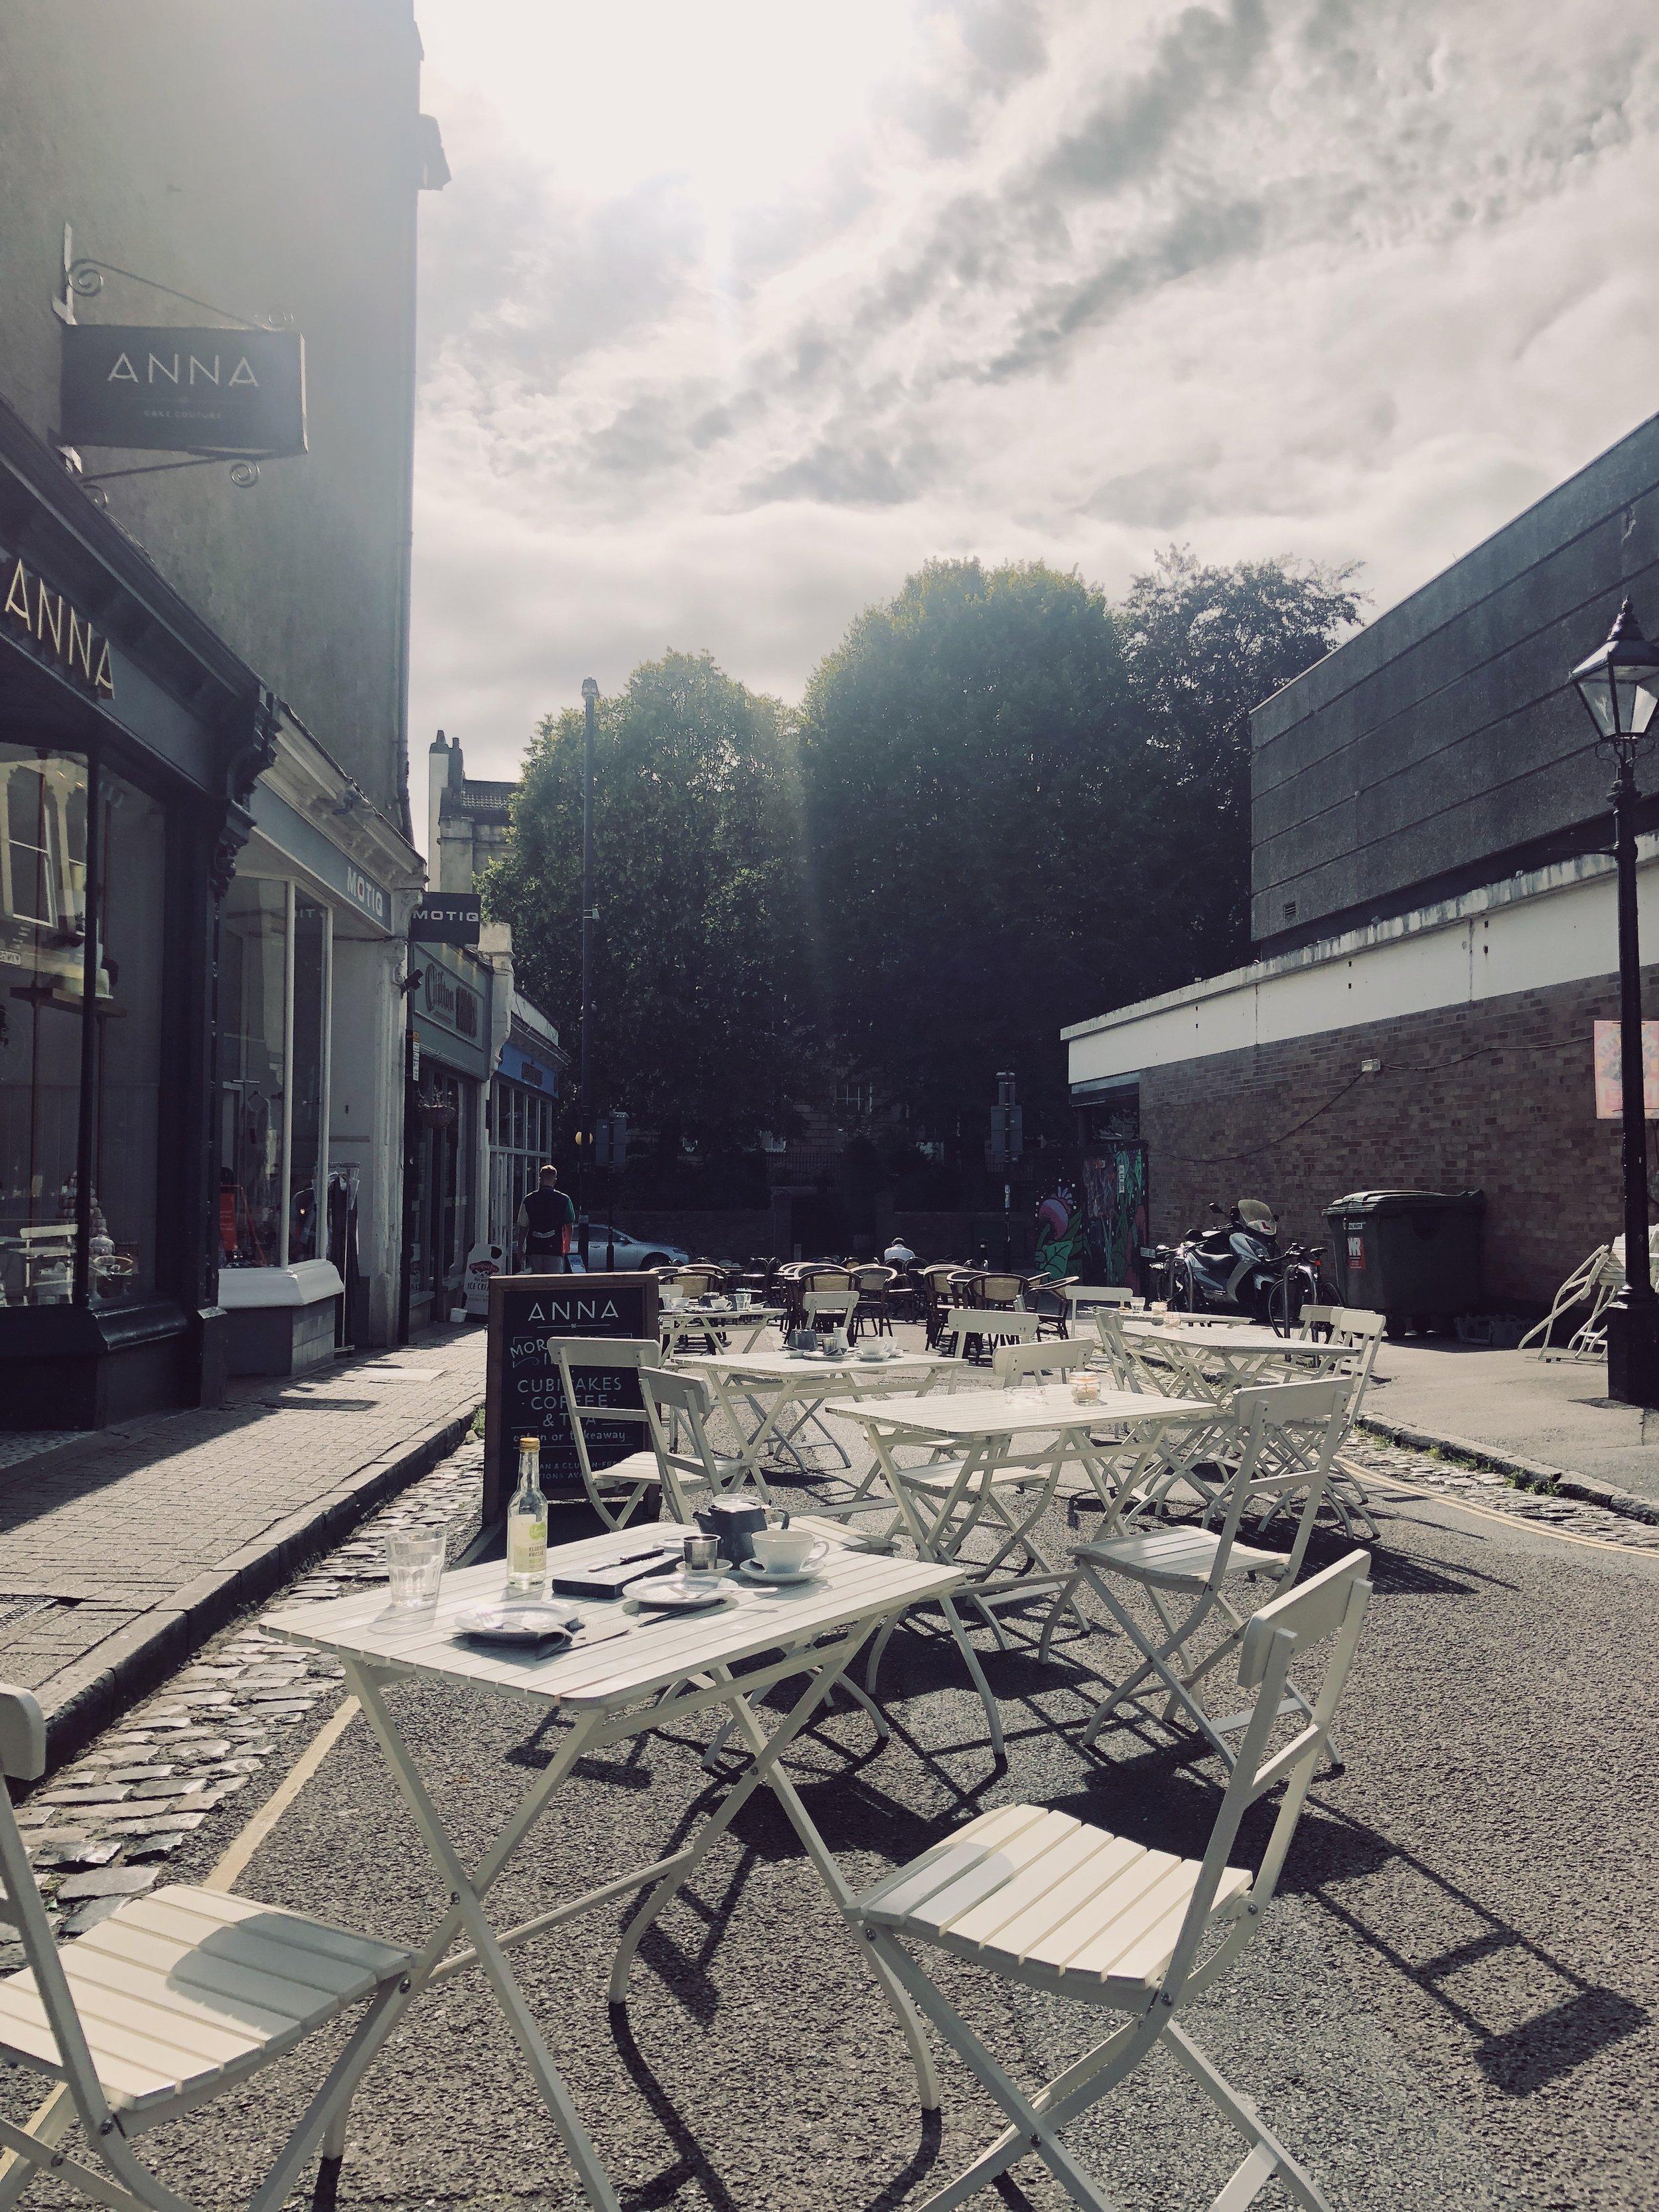 Cafe by Clifton Arcades